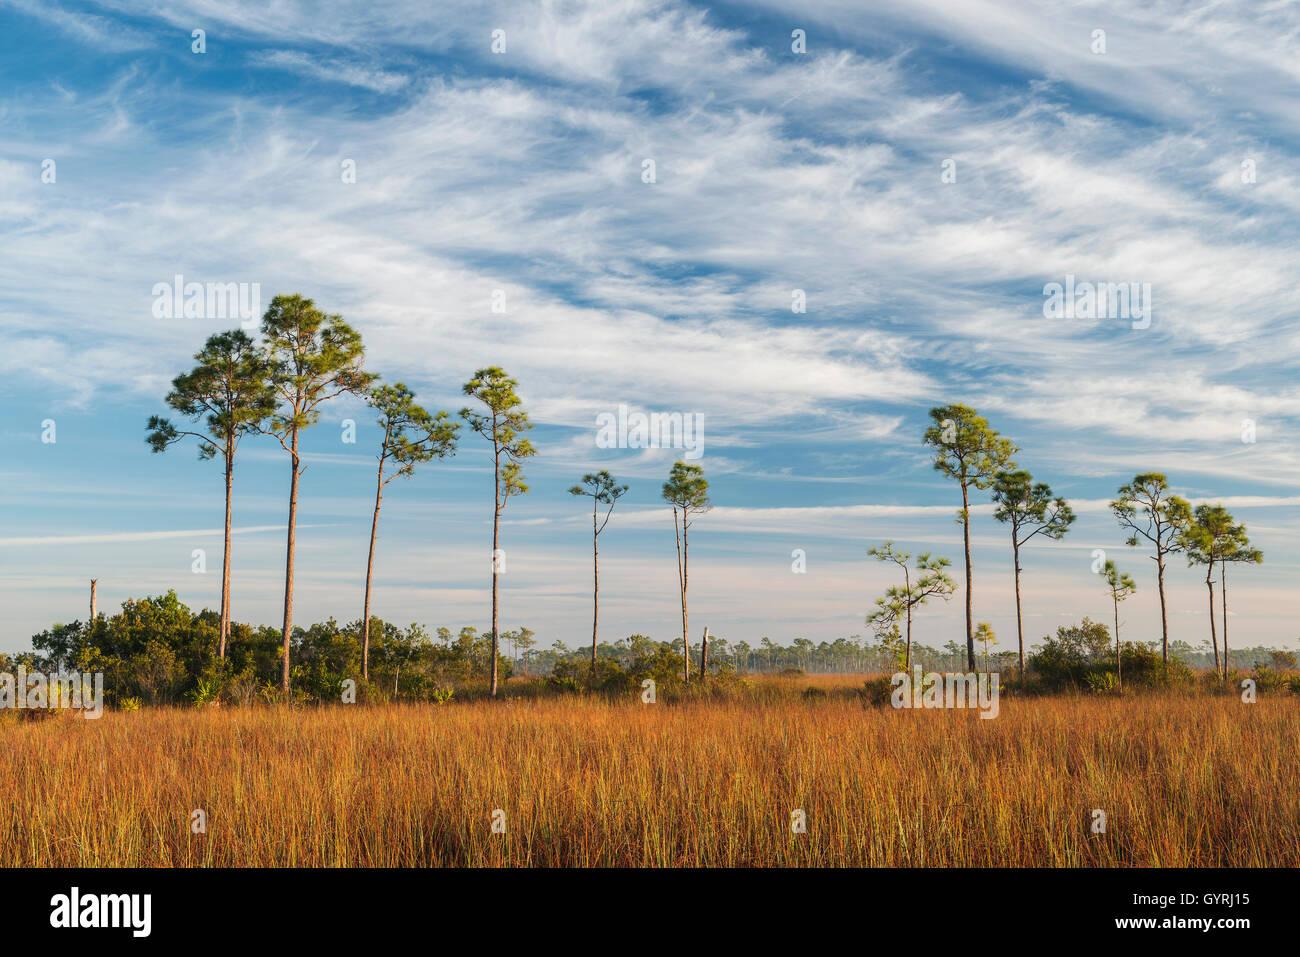 Sawgrass Prairie and Slash Pine Trees (Pinus elliottii), Everglades National Park, Florida USA  Dembin - Stock Image